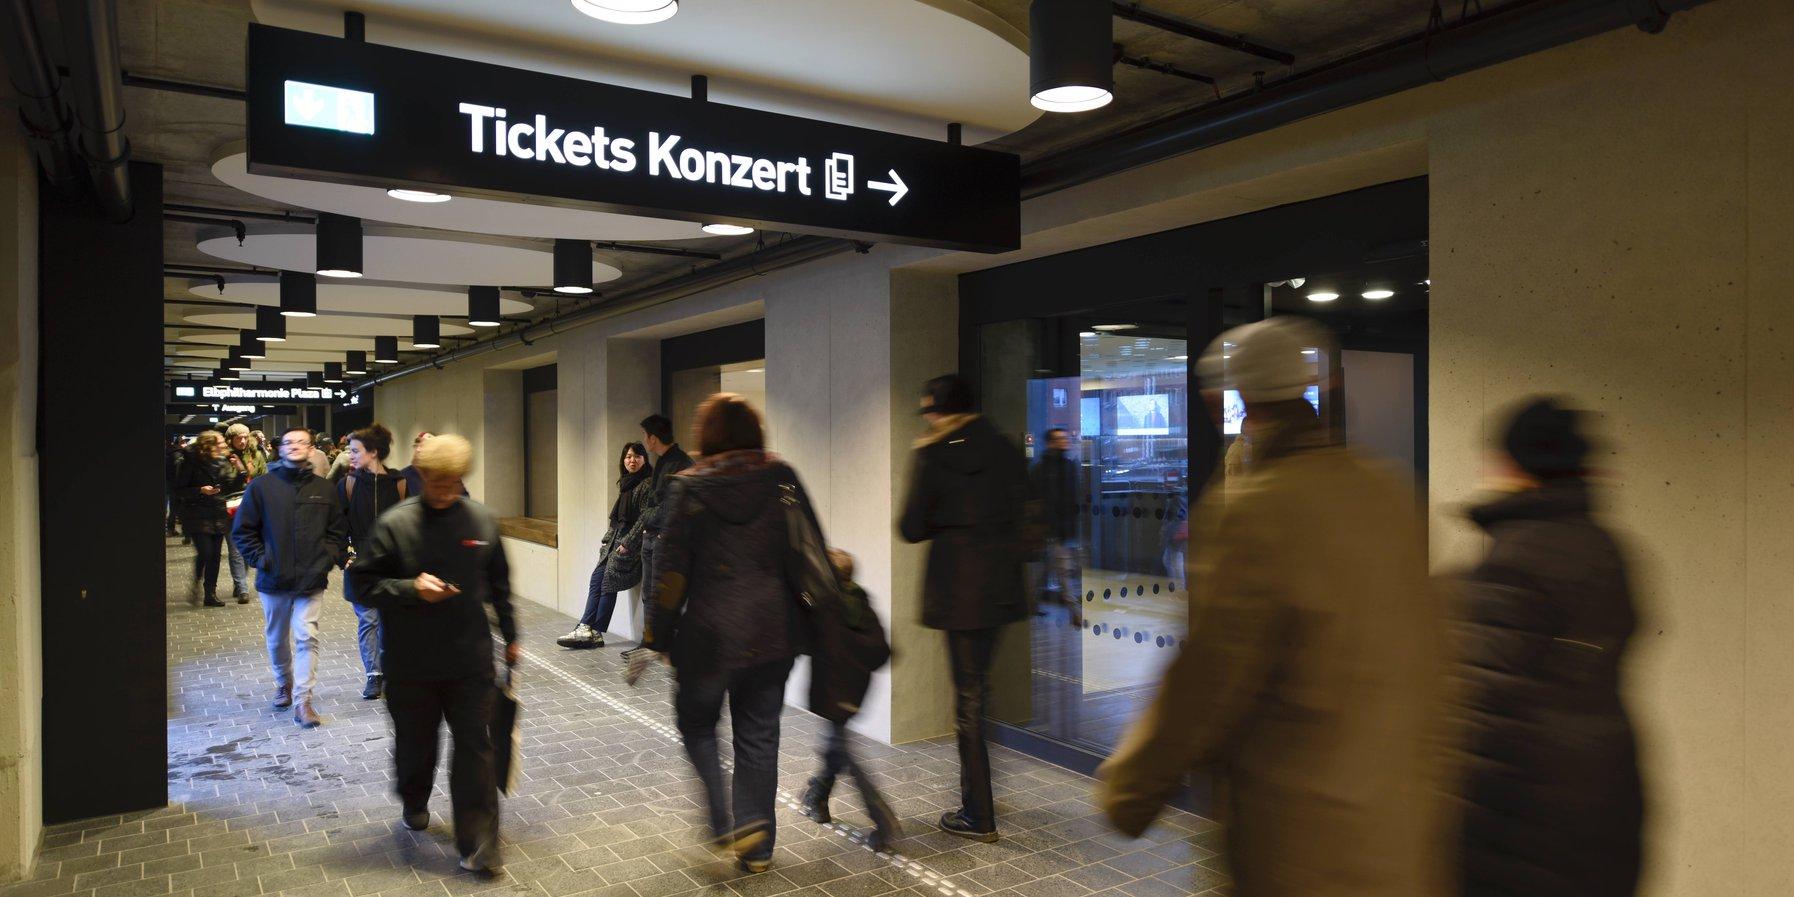 Elbphilharmonie Ticket Shop